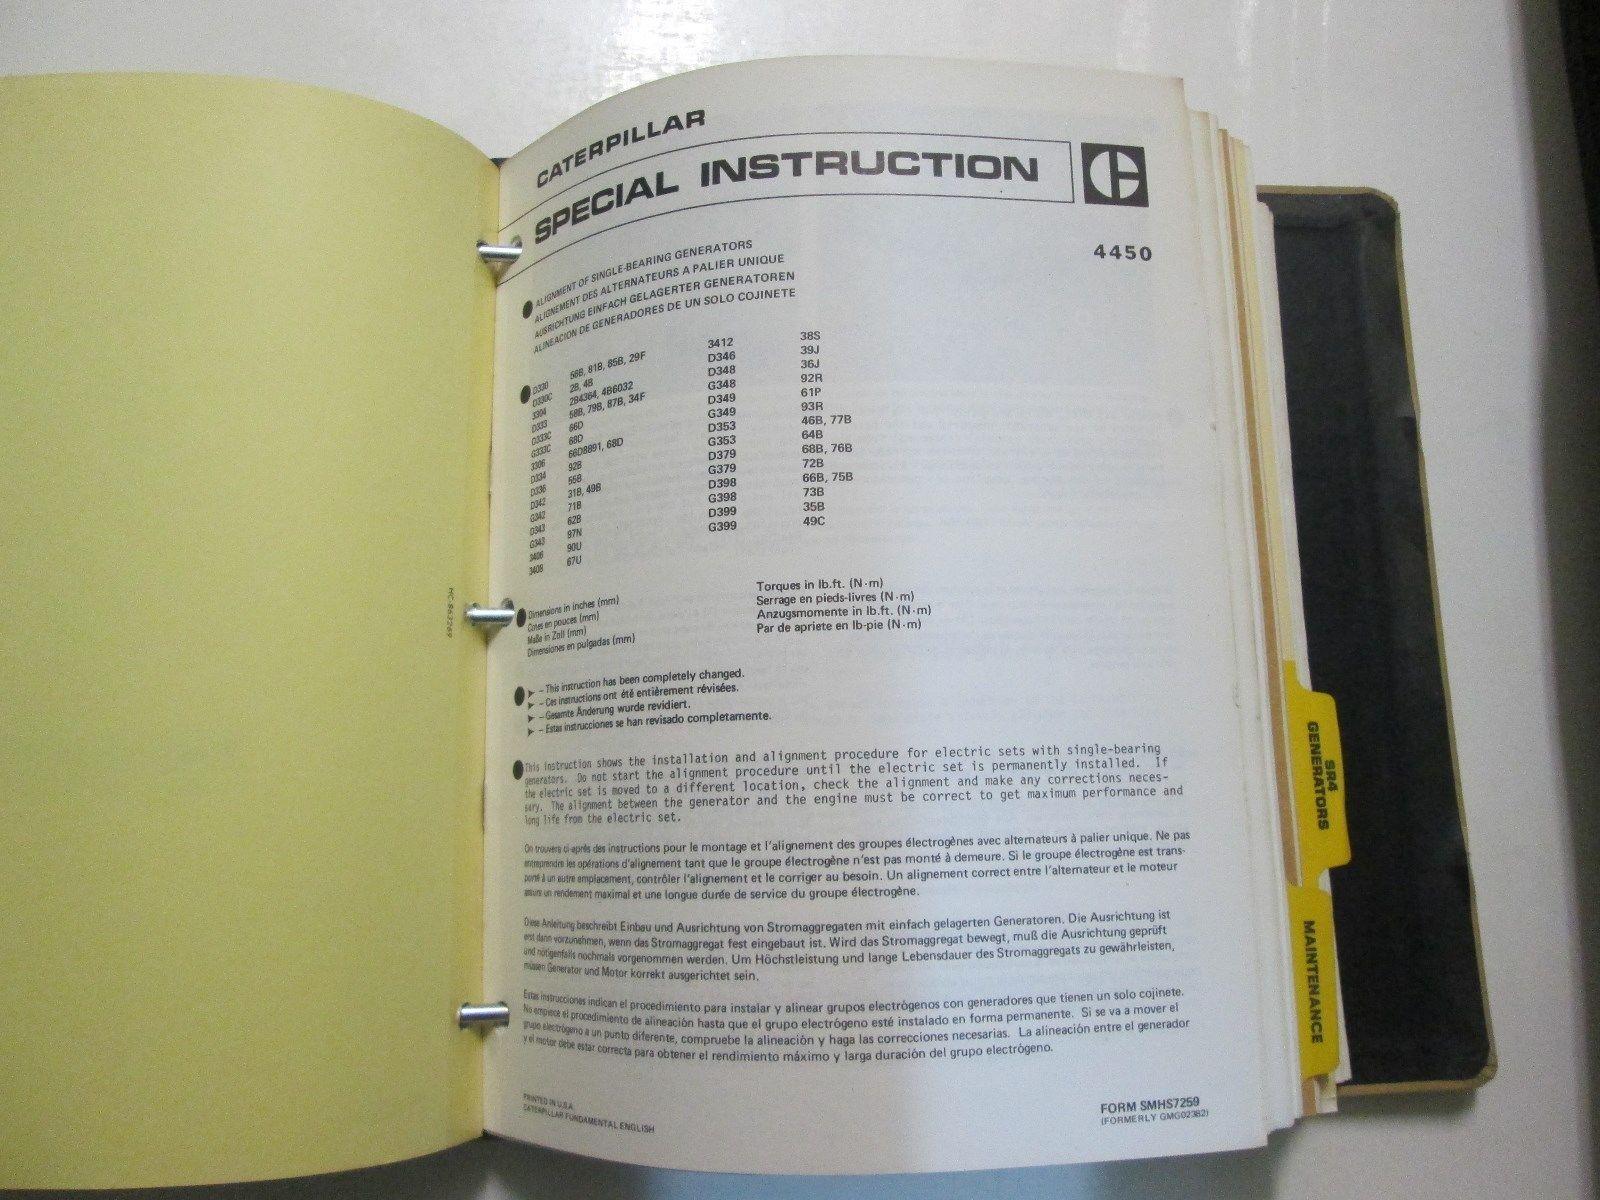 Caterpillar 3406 workshop manual : Knc coin forum jobs